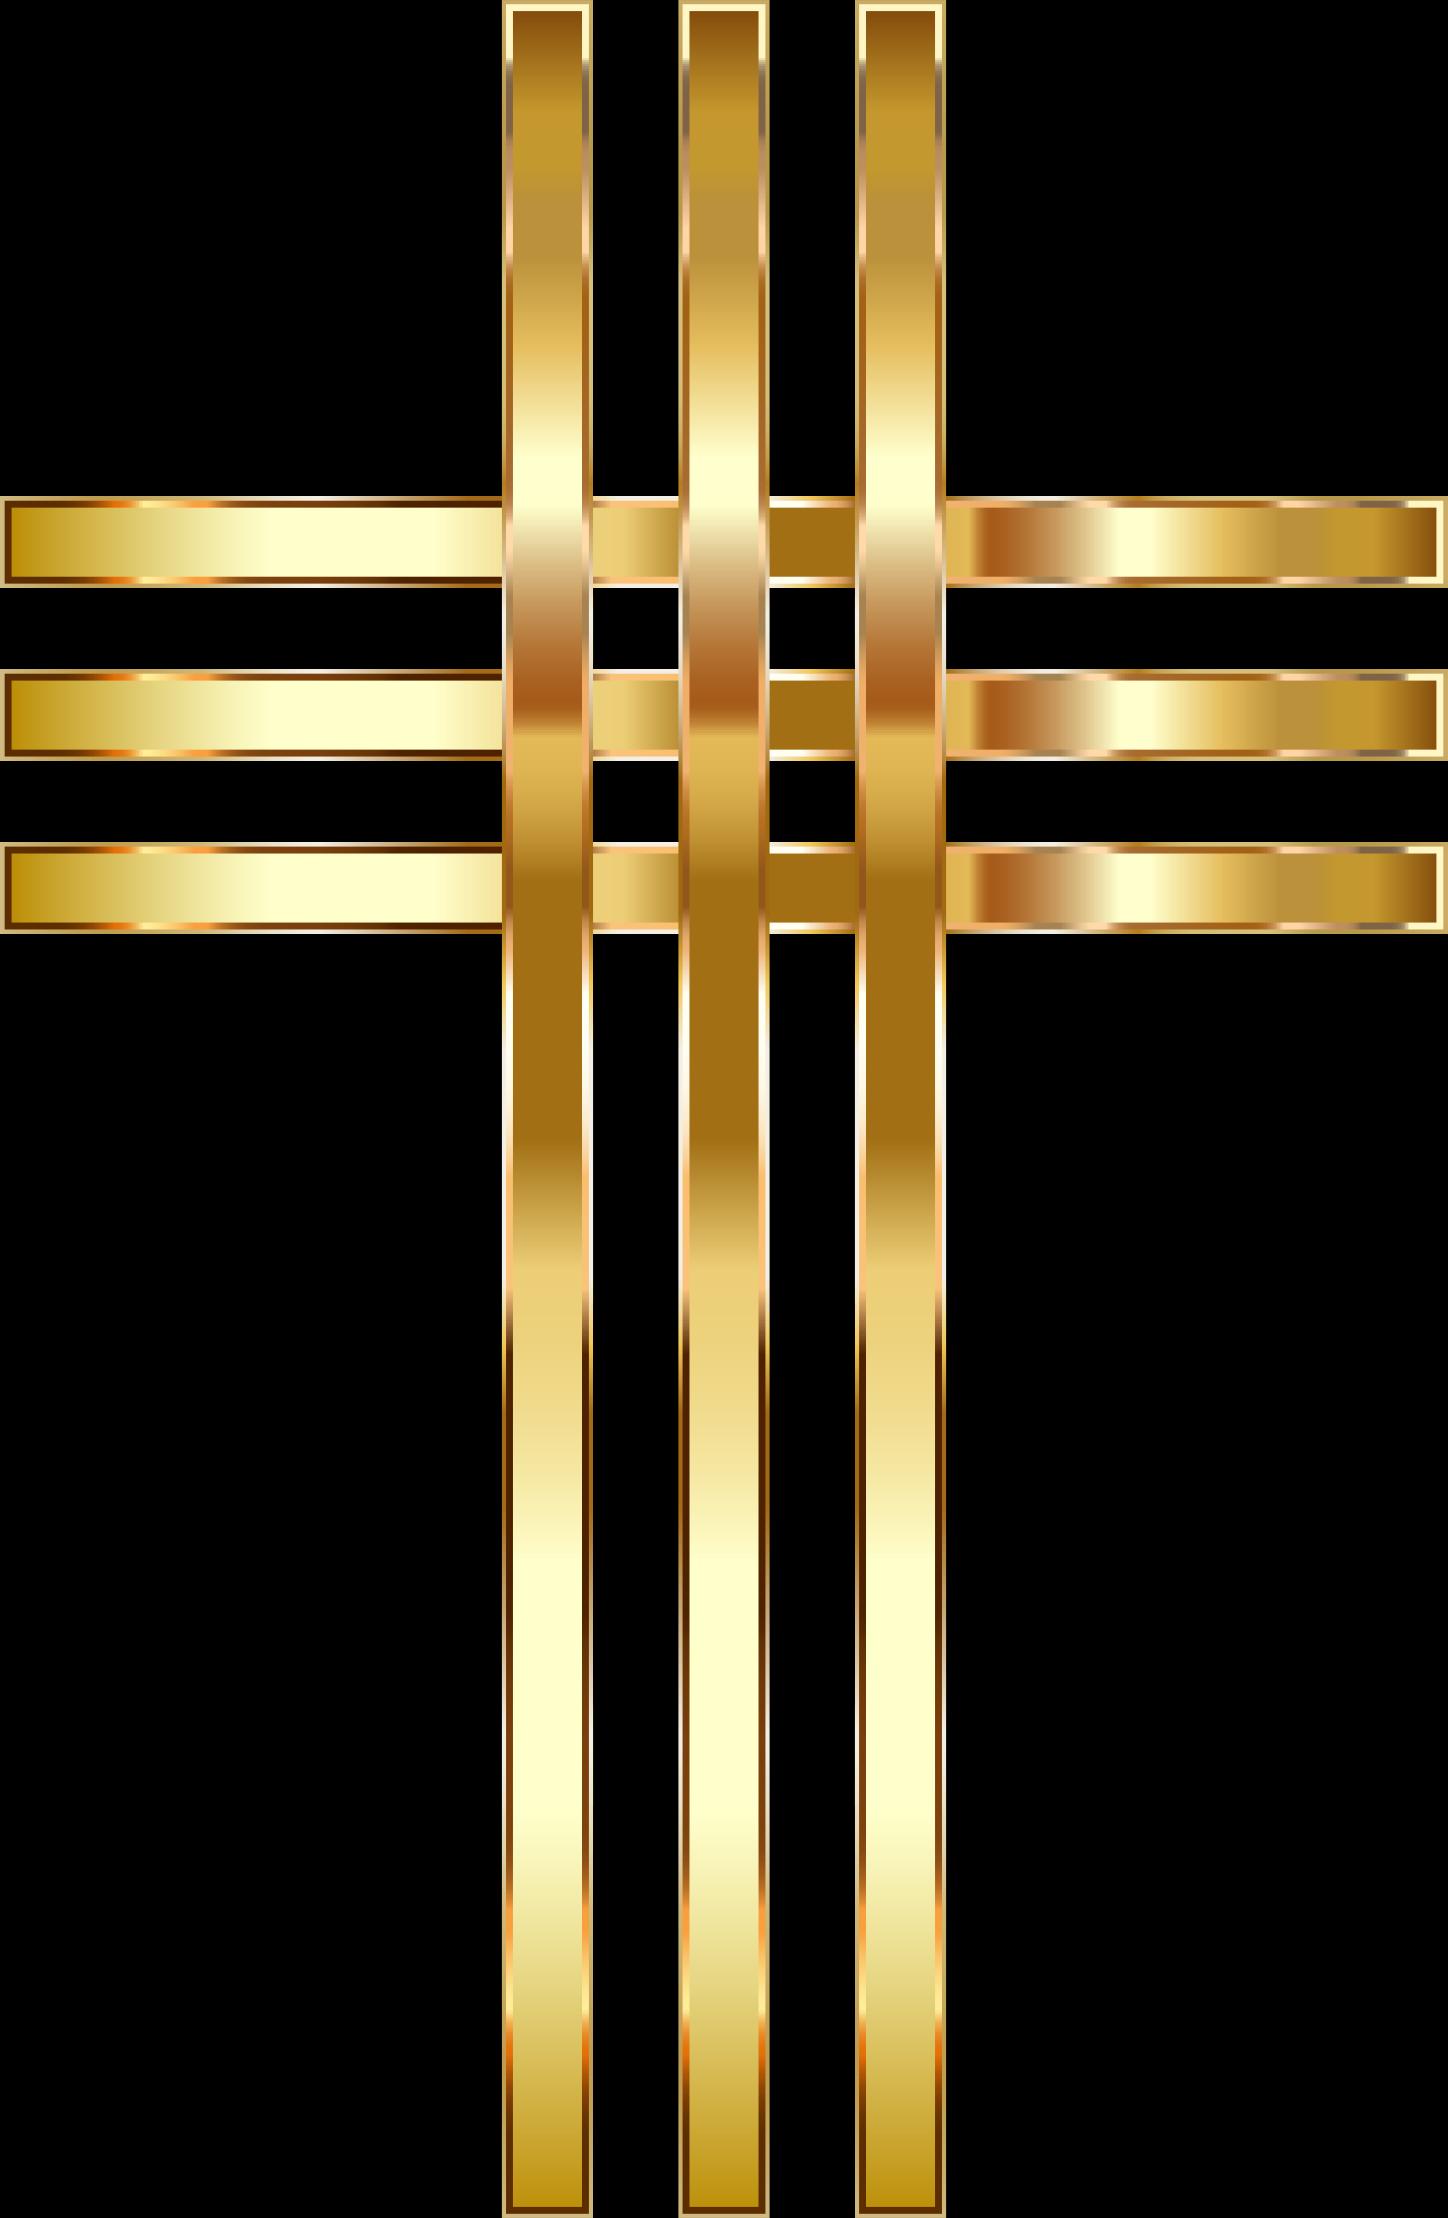 Crucifix clipart transparent background. Stylized golden cross no